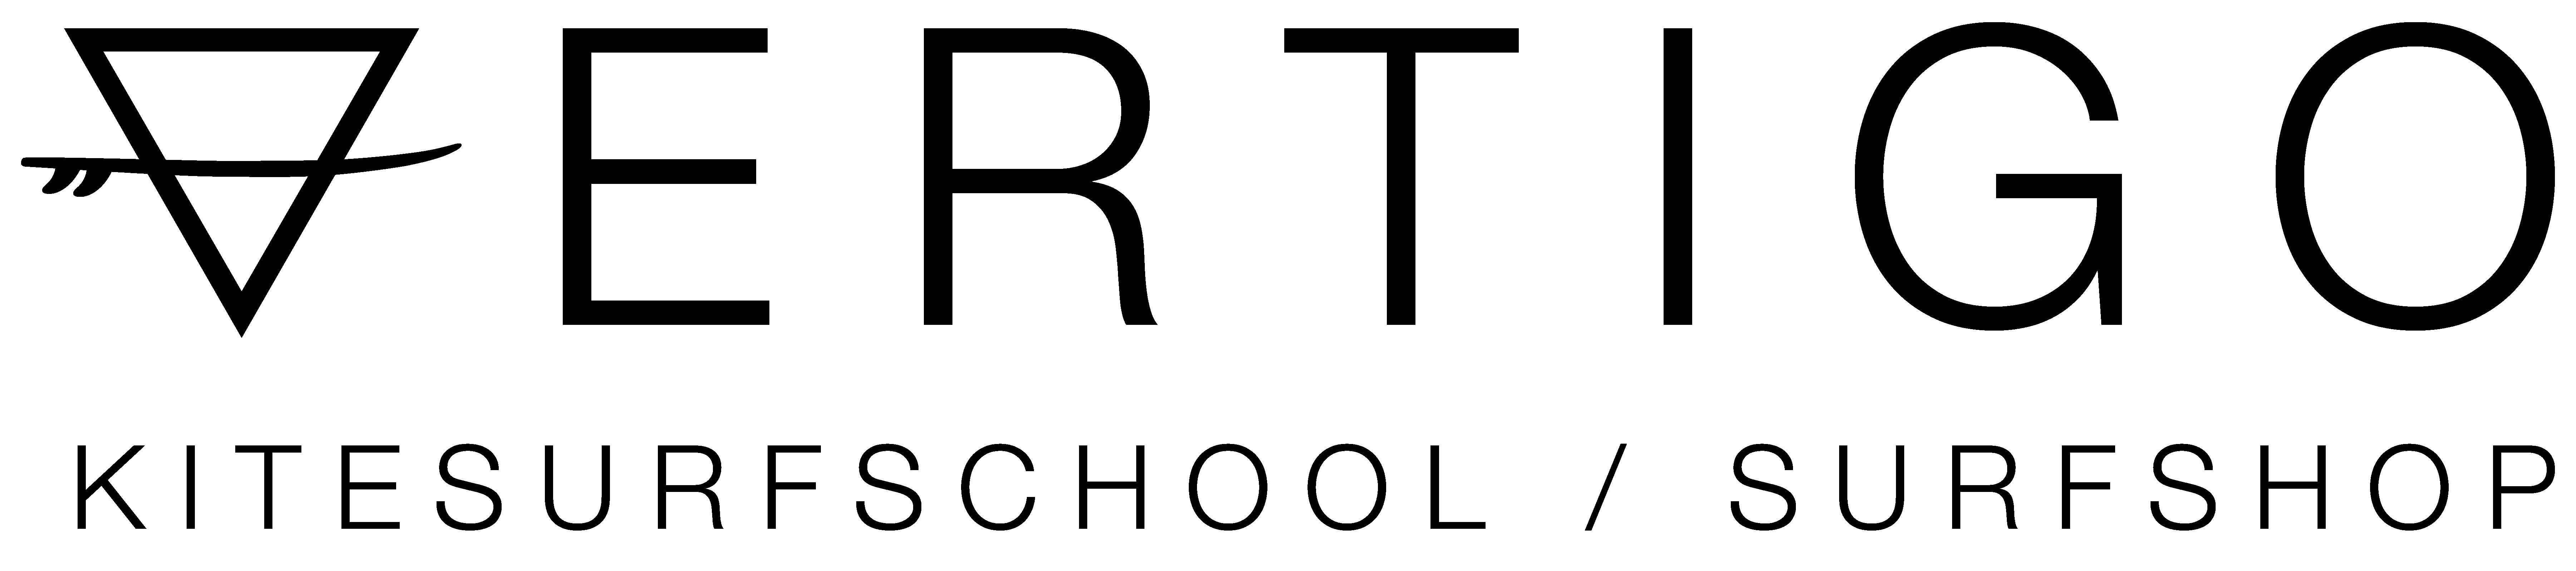 Vertigo